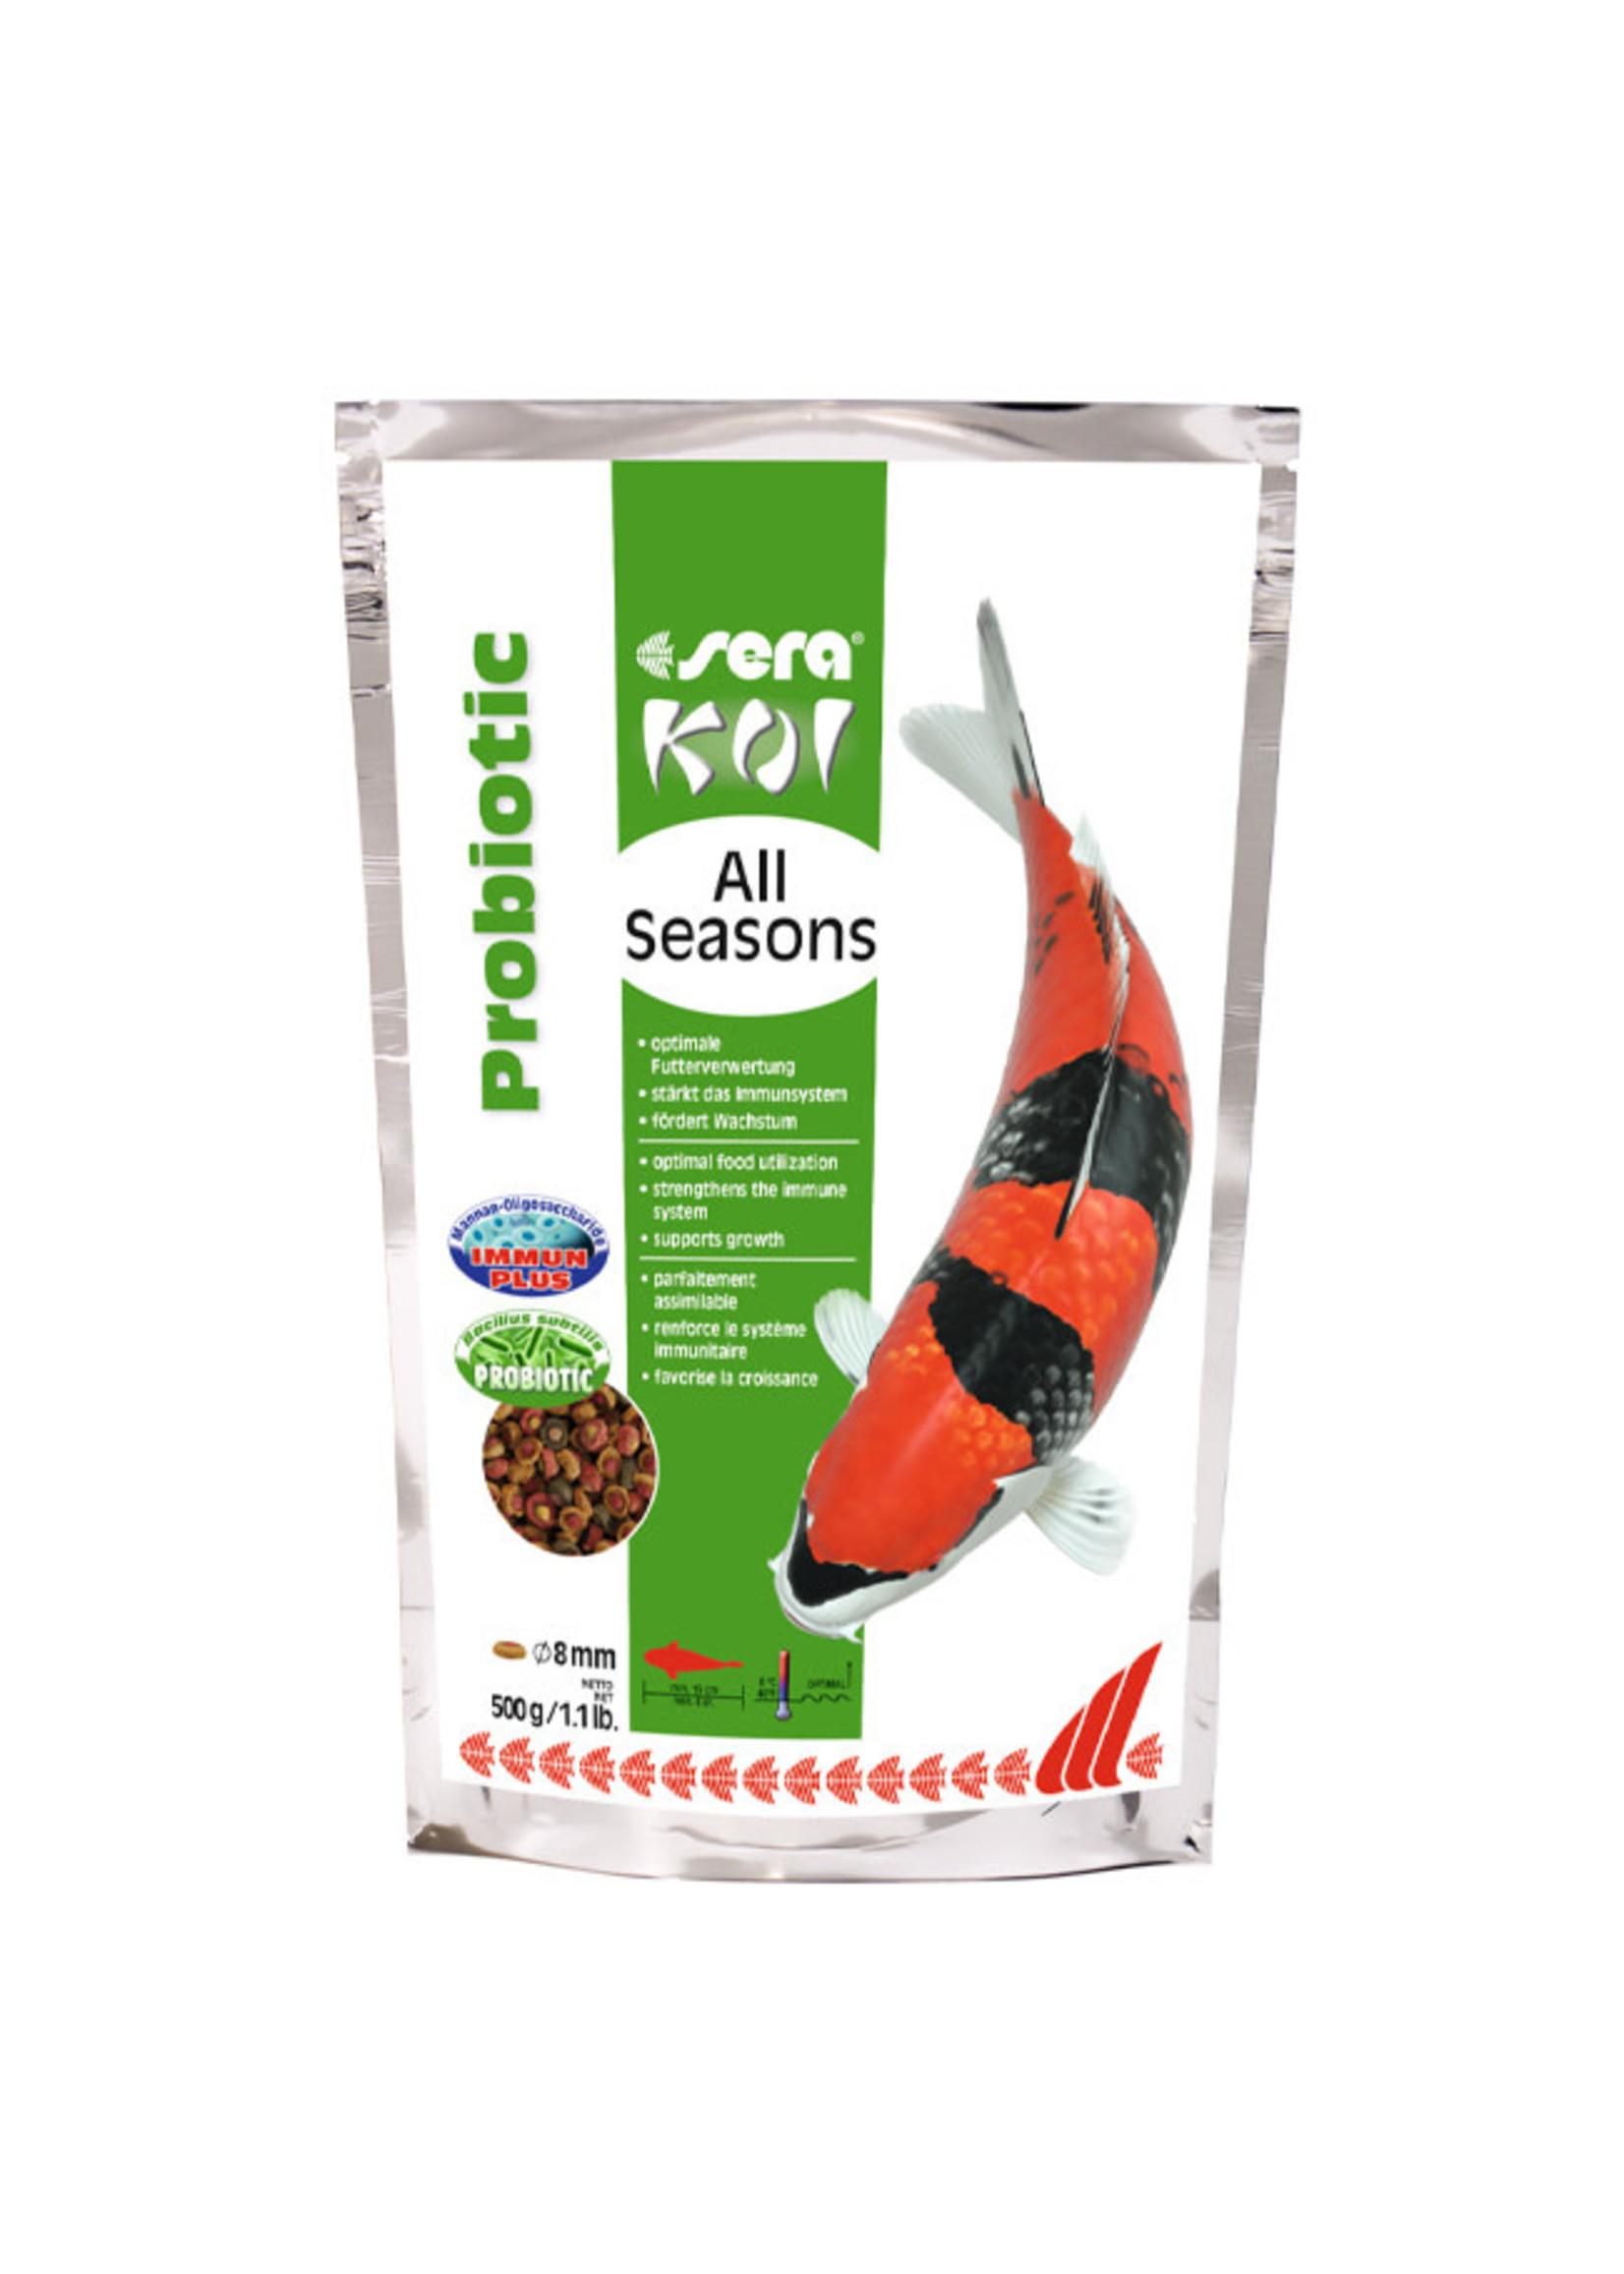 sera sera Koi Probiotic All Seasons Food 500g / 1.1lb